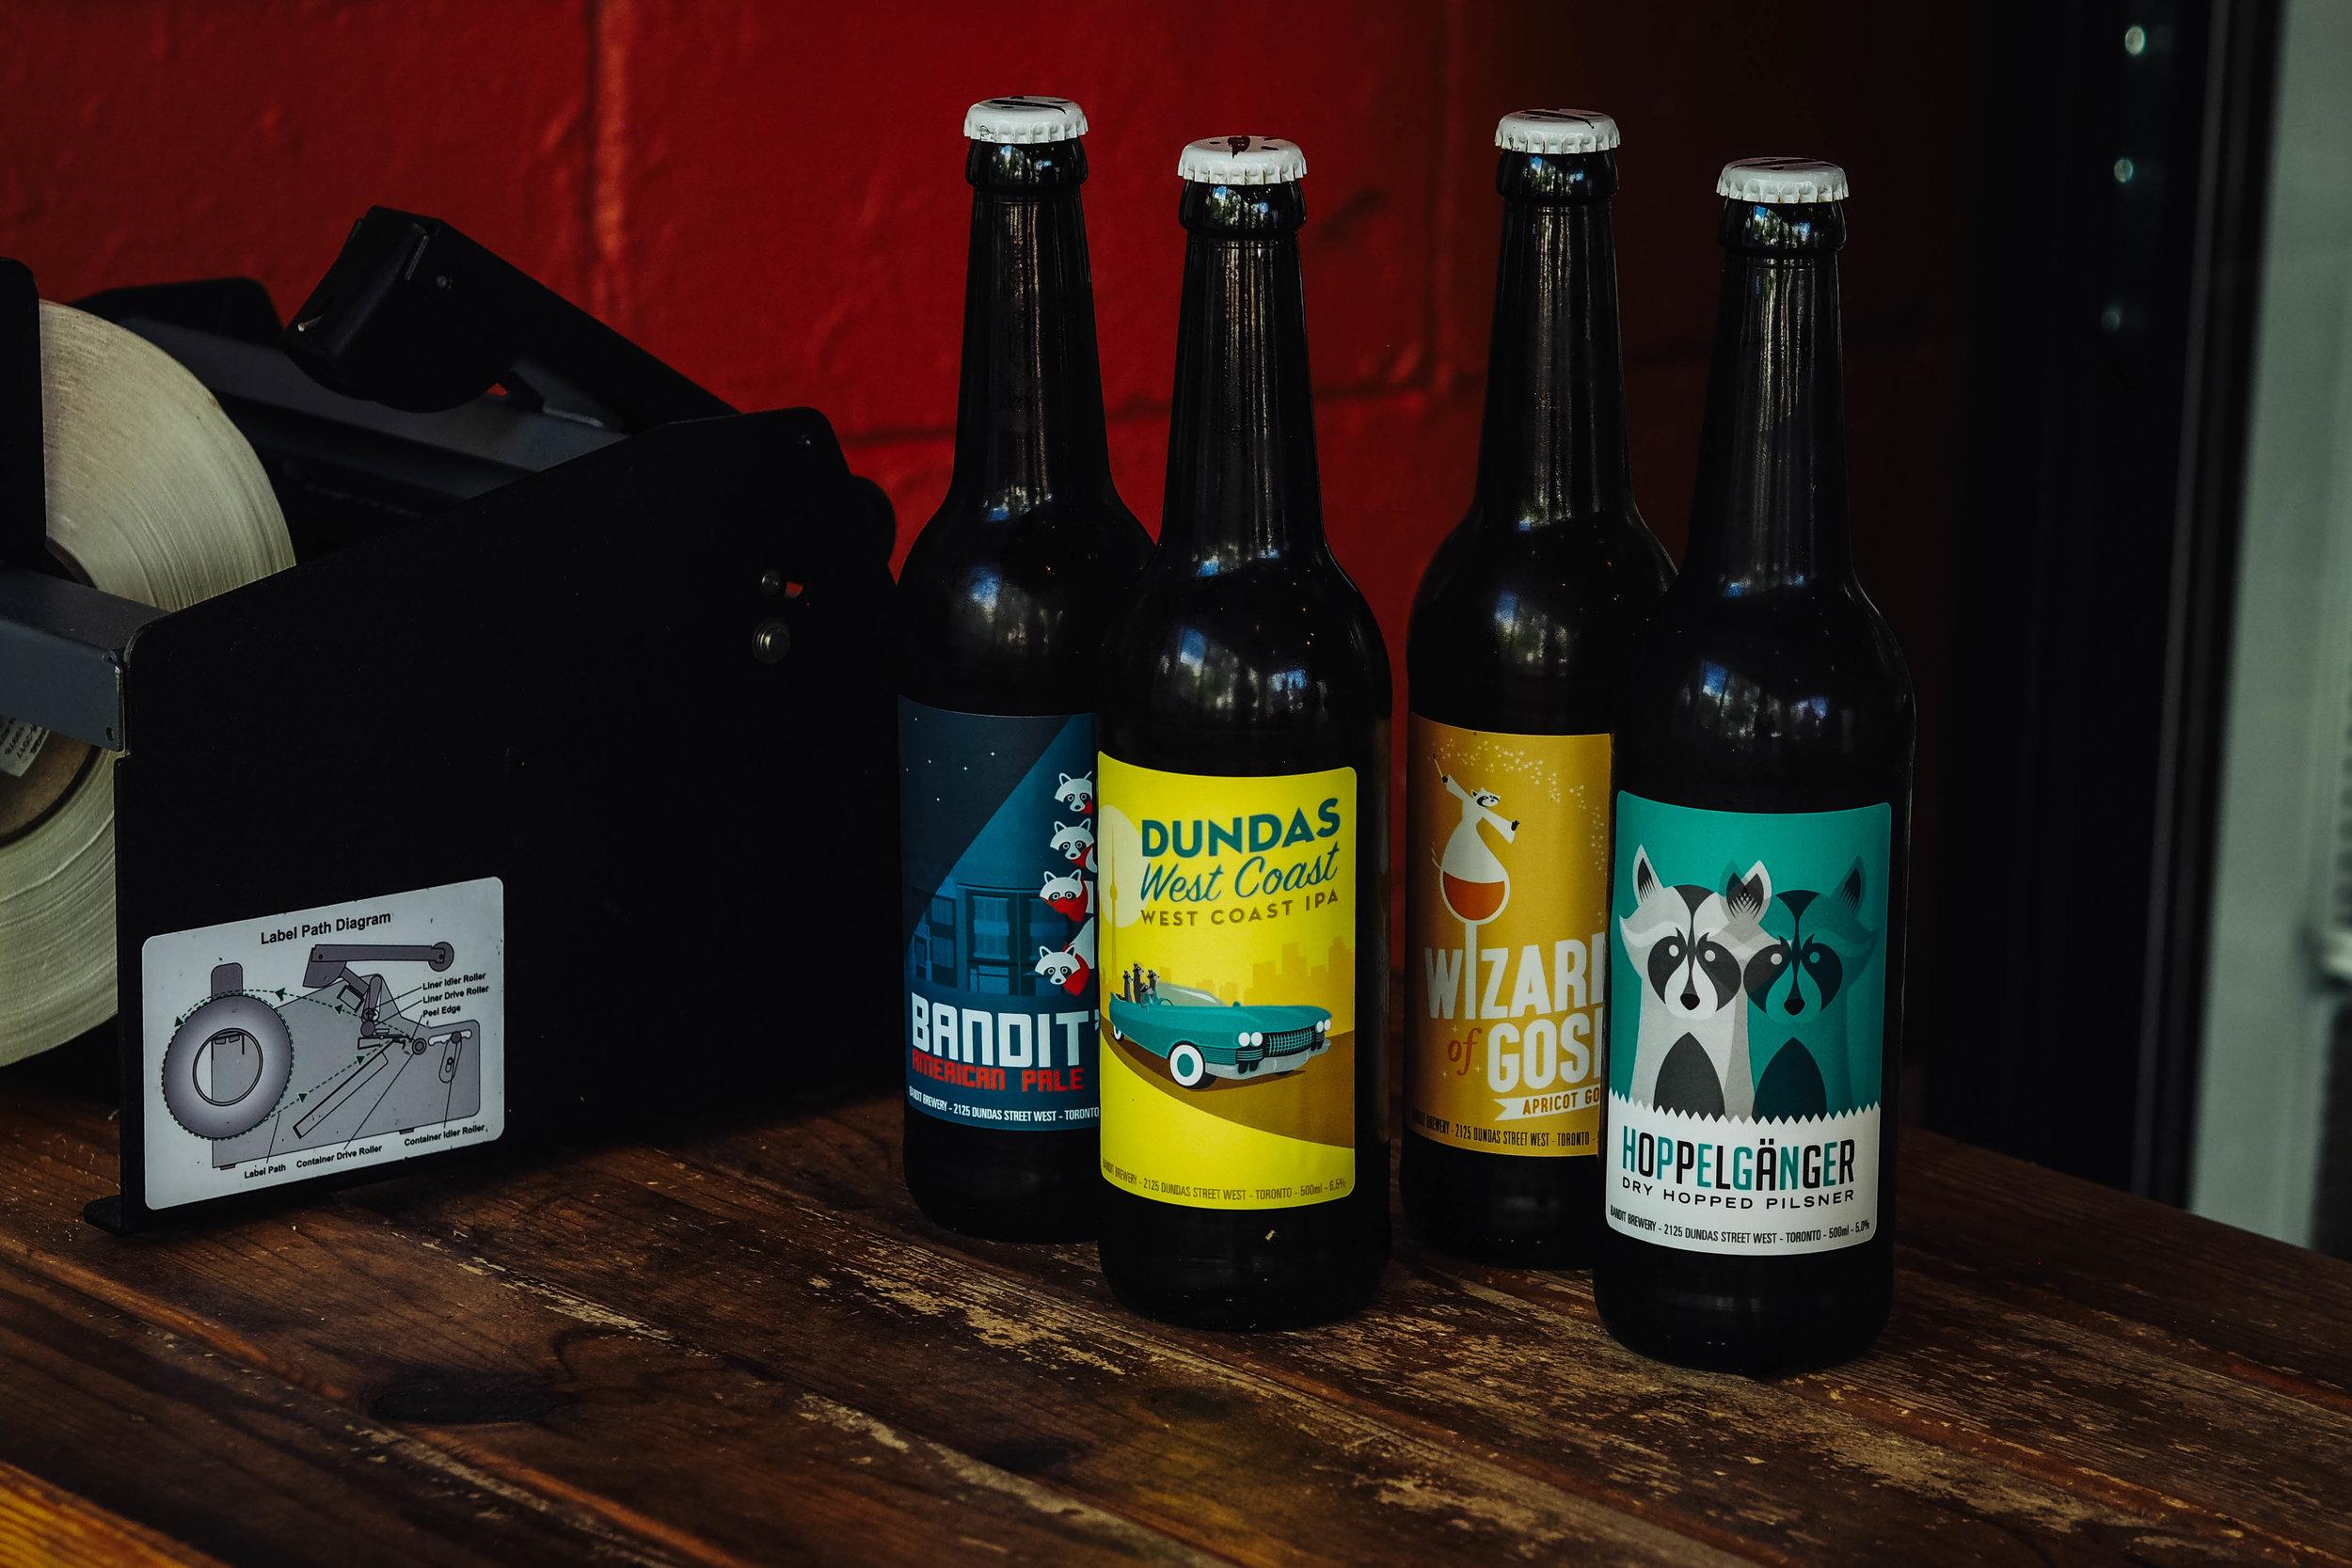 bandit brewery toronto beer